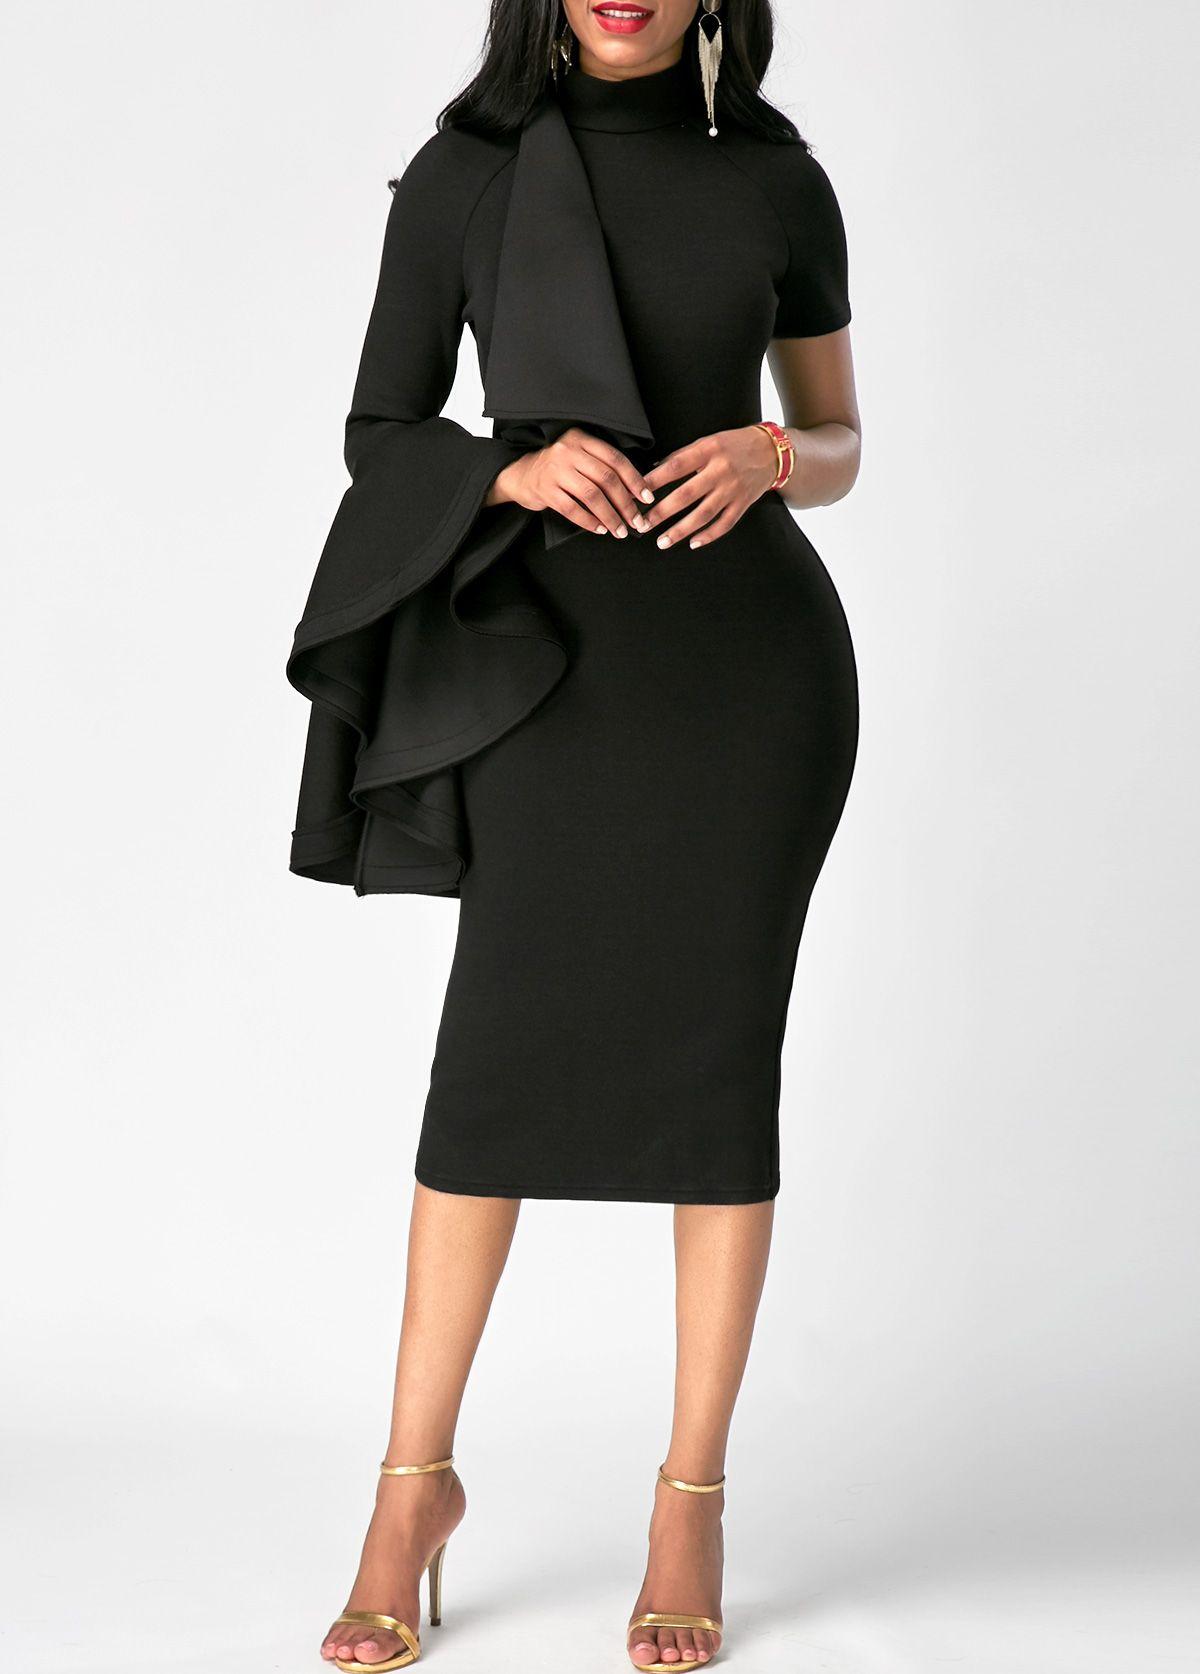 Black Bell Sleeve High Neck Bodycon Midi Dress Vestidos Coctel Moda Estilo Moda [ 1674 x 1200 Pixel ]